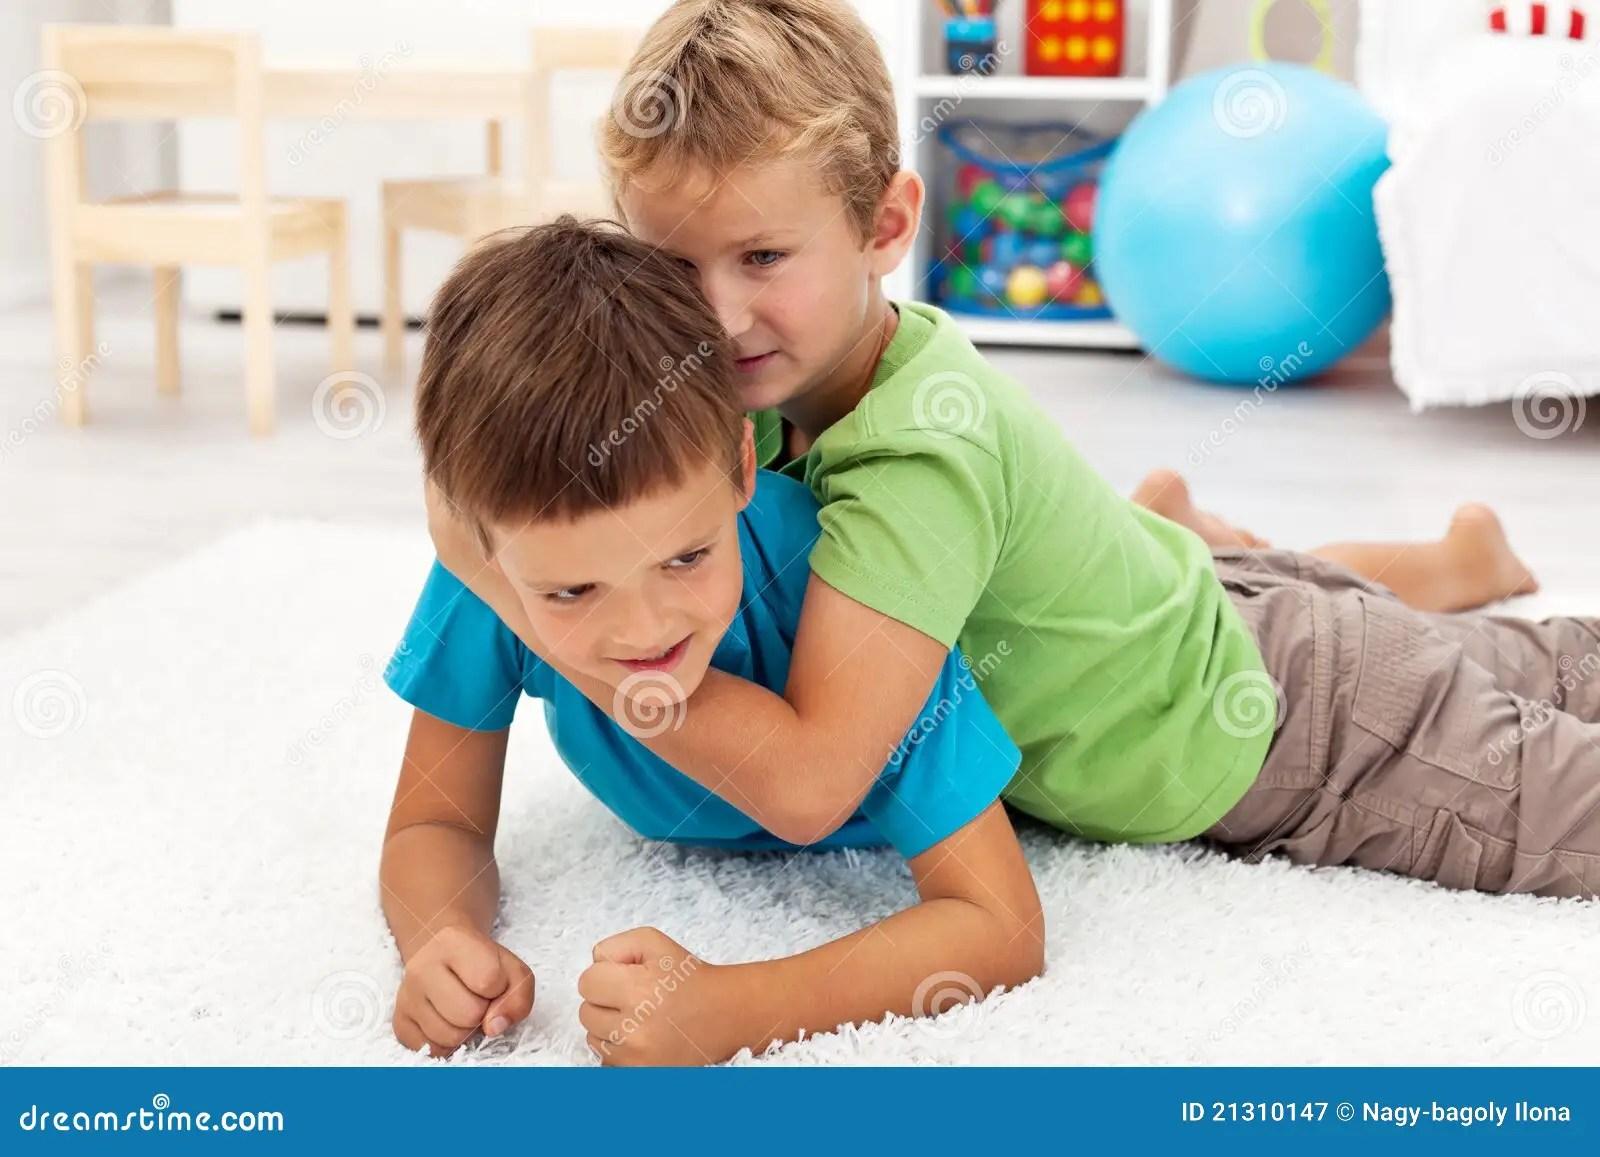 Kids Wrestling Stock Images